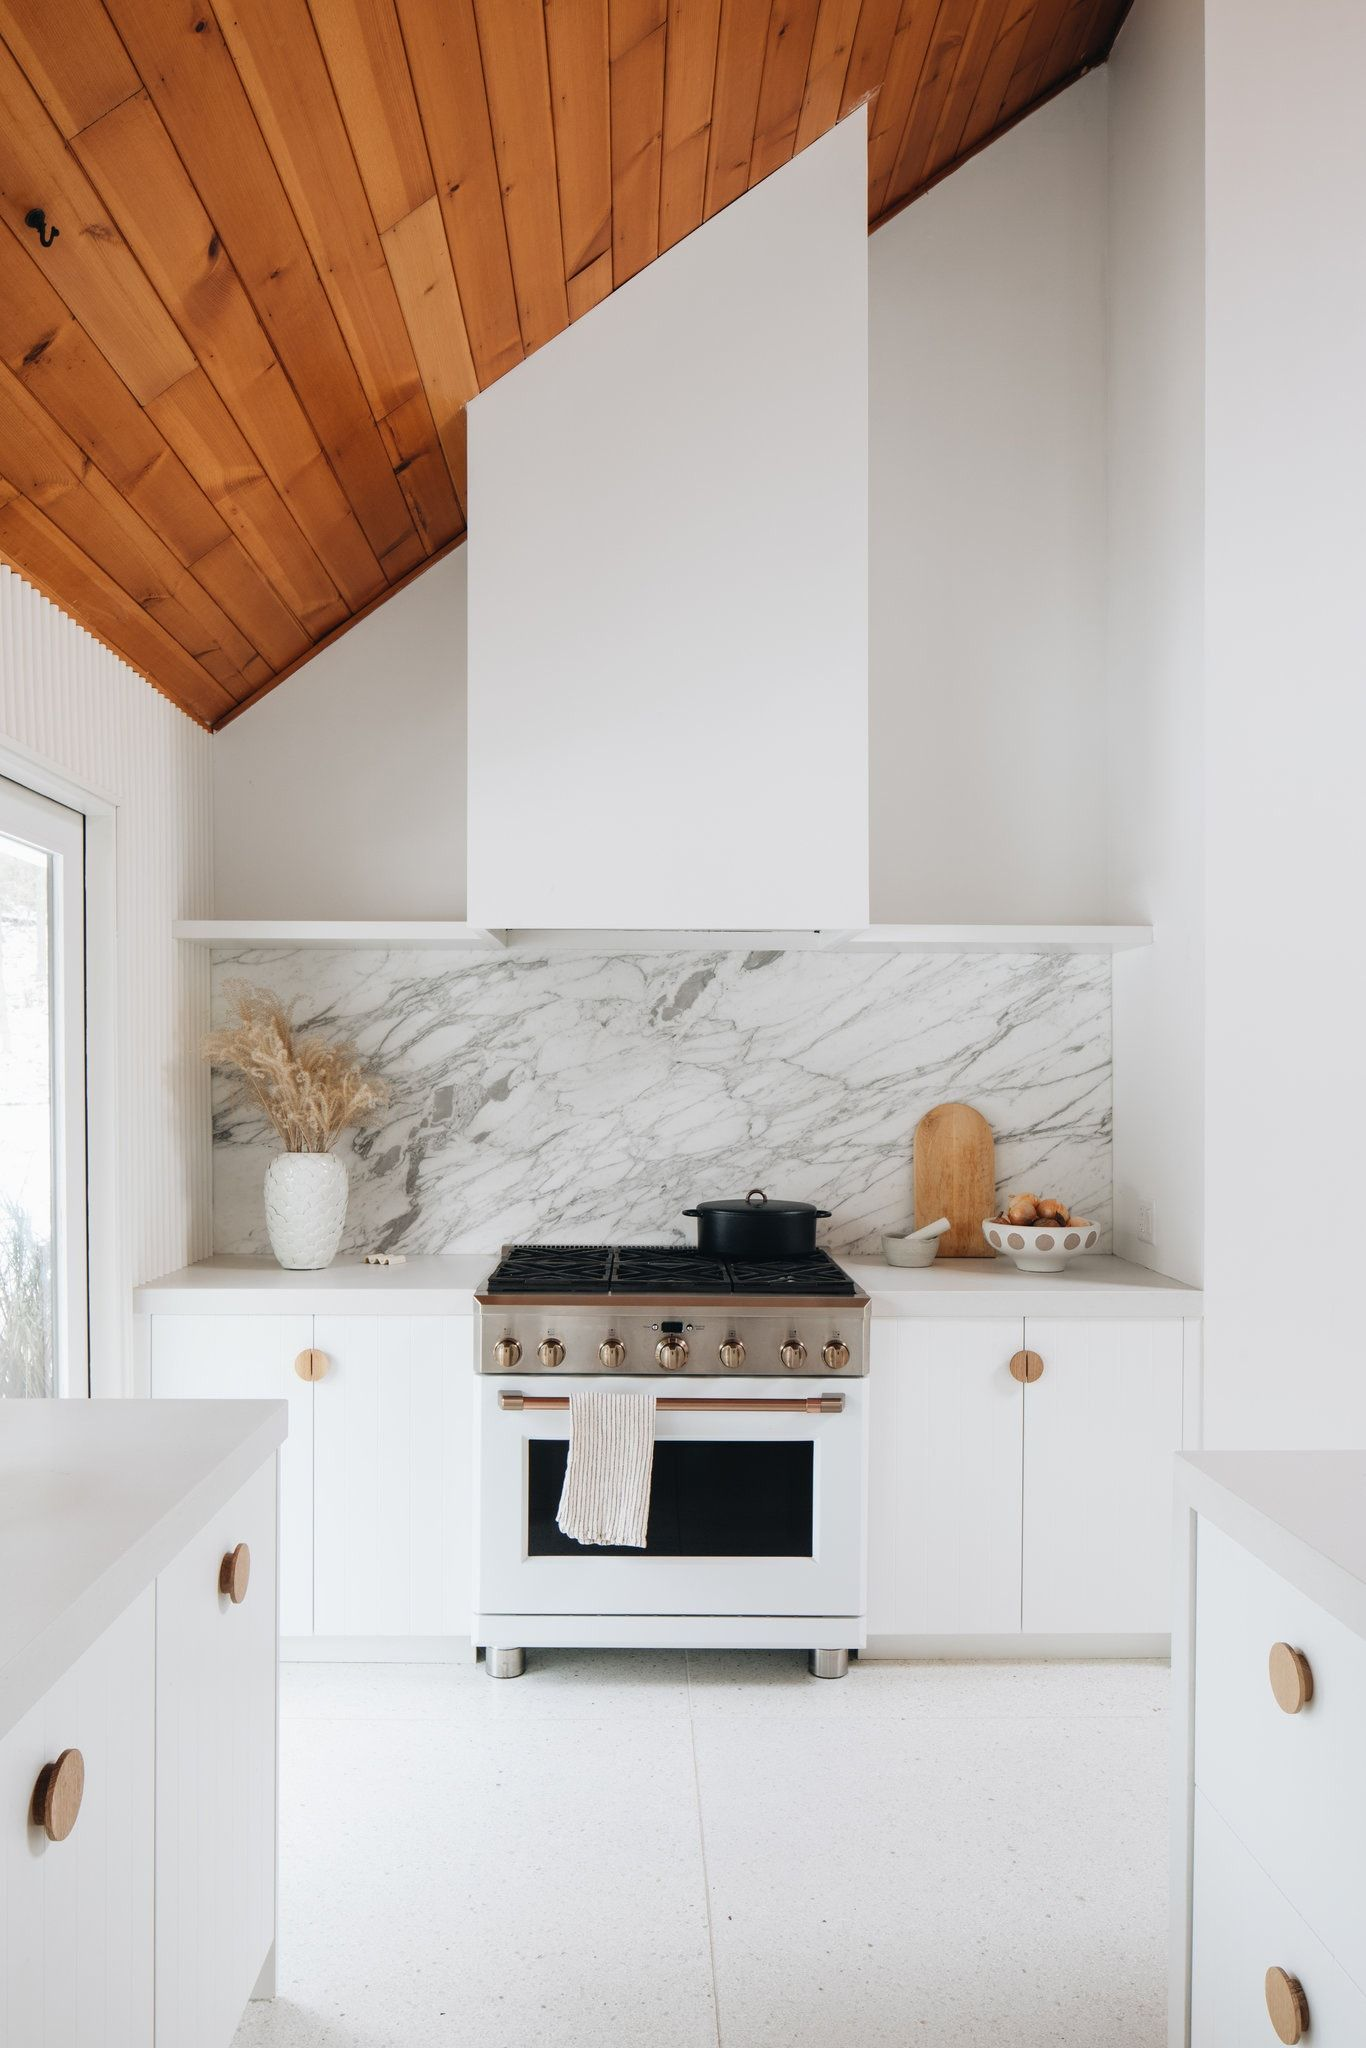 No Budget For A Custom Kitchen No Problem The New York Times In 2020 White Marble Kitchen White Ikea Kitchen Minimalist Kitchen Design